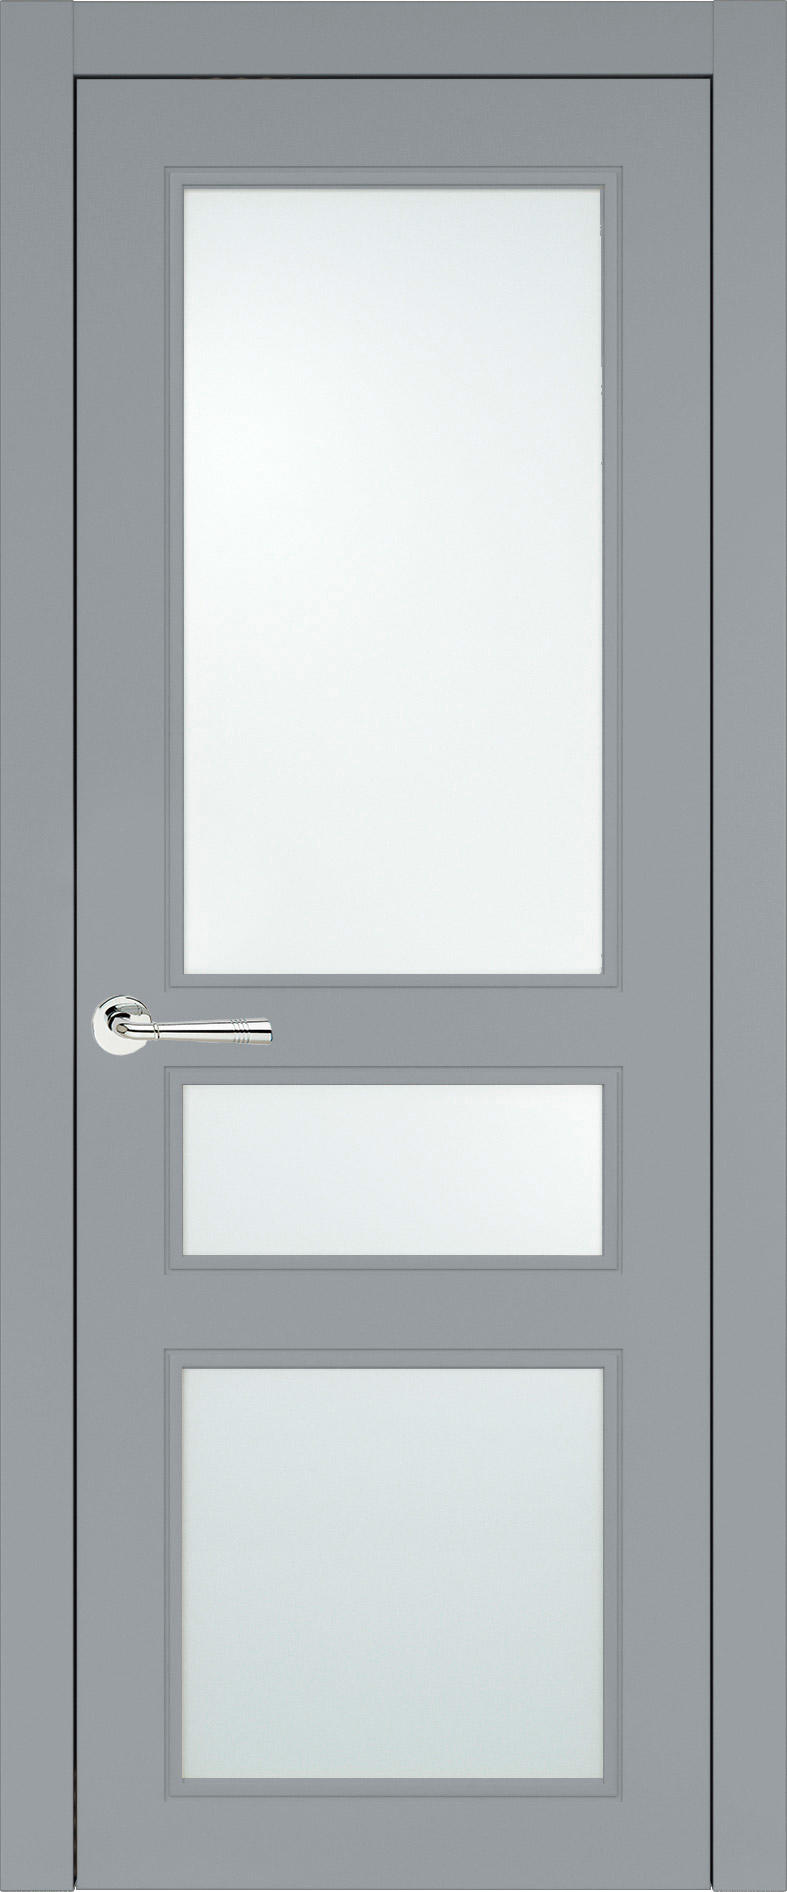 Imperia-R Neo Classic цвет - Серебристо-серая эмаль (RAL 7045) Со стеклом (ДО)